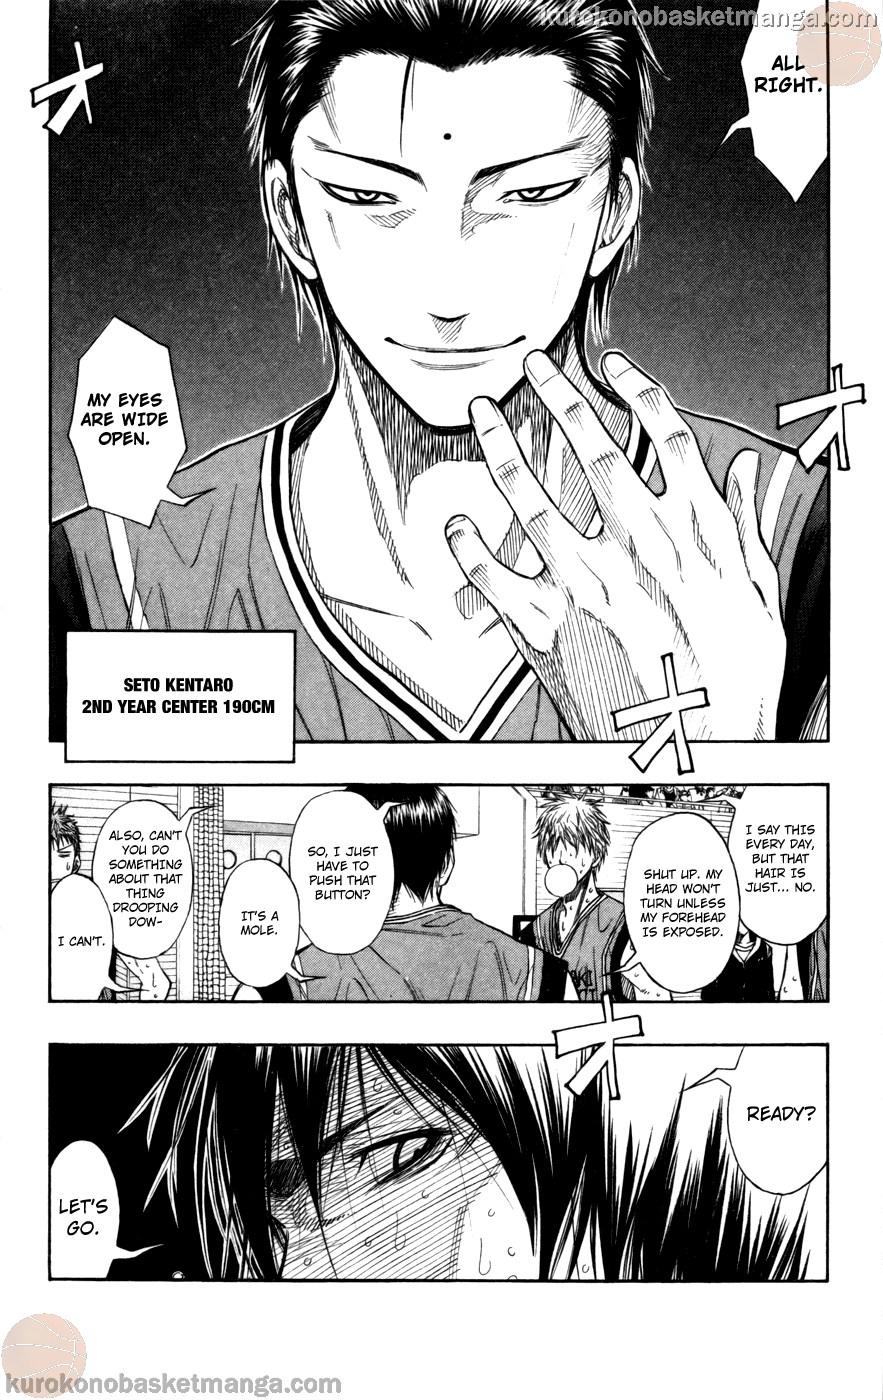 Kuroko no Basket Manga Chapter 104 - Image 06